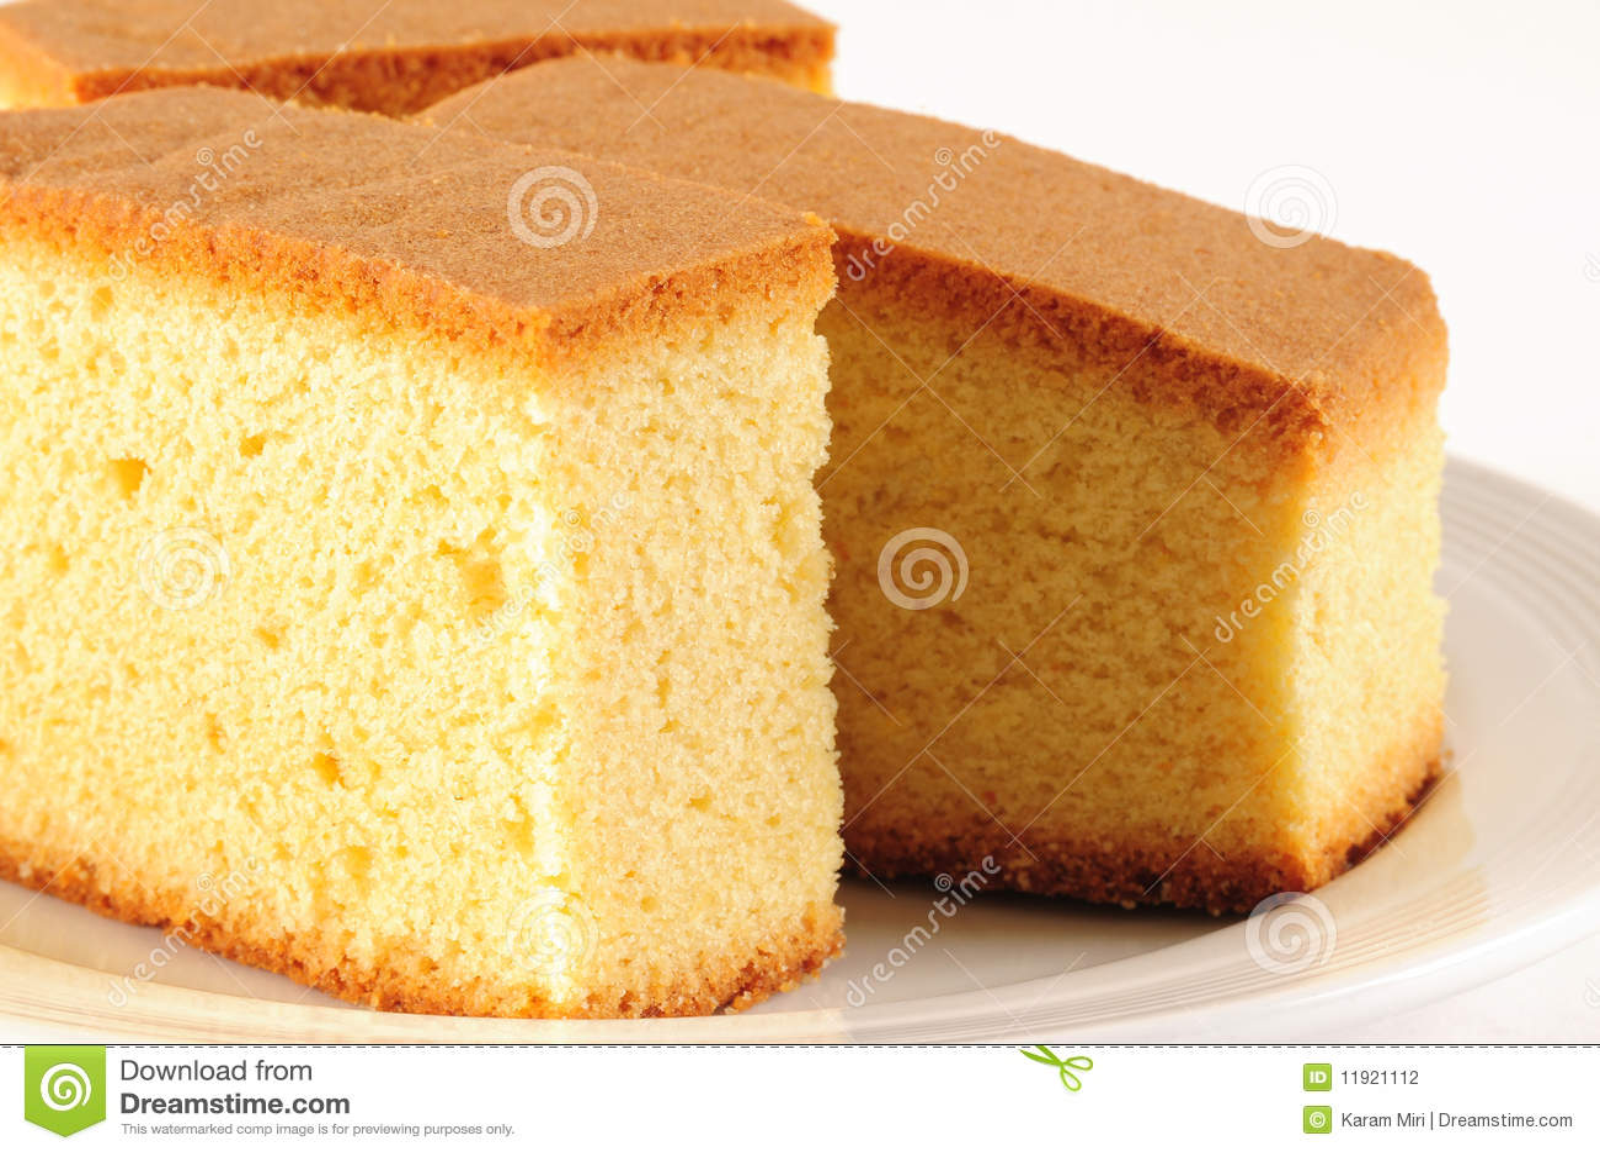 Sponge cake stock photo. Image of sweet, stack, texture ...